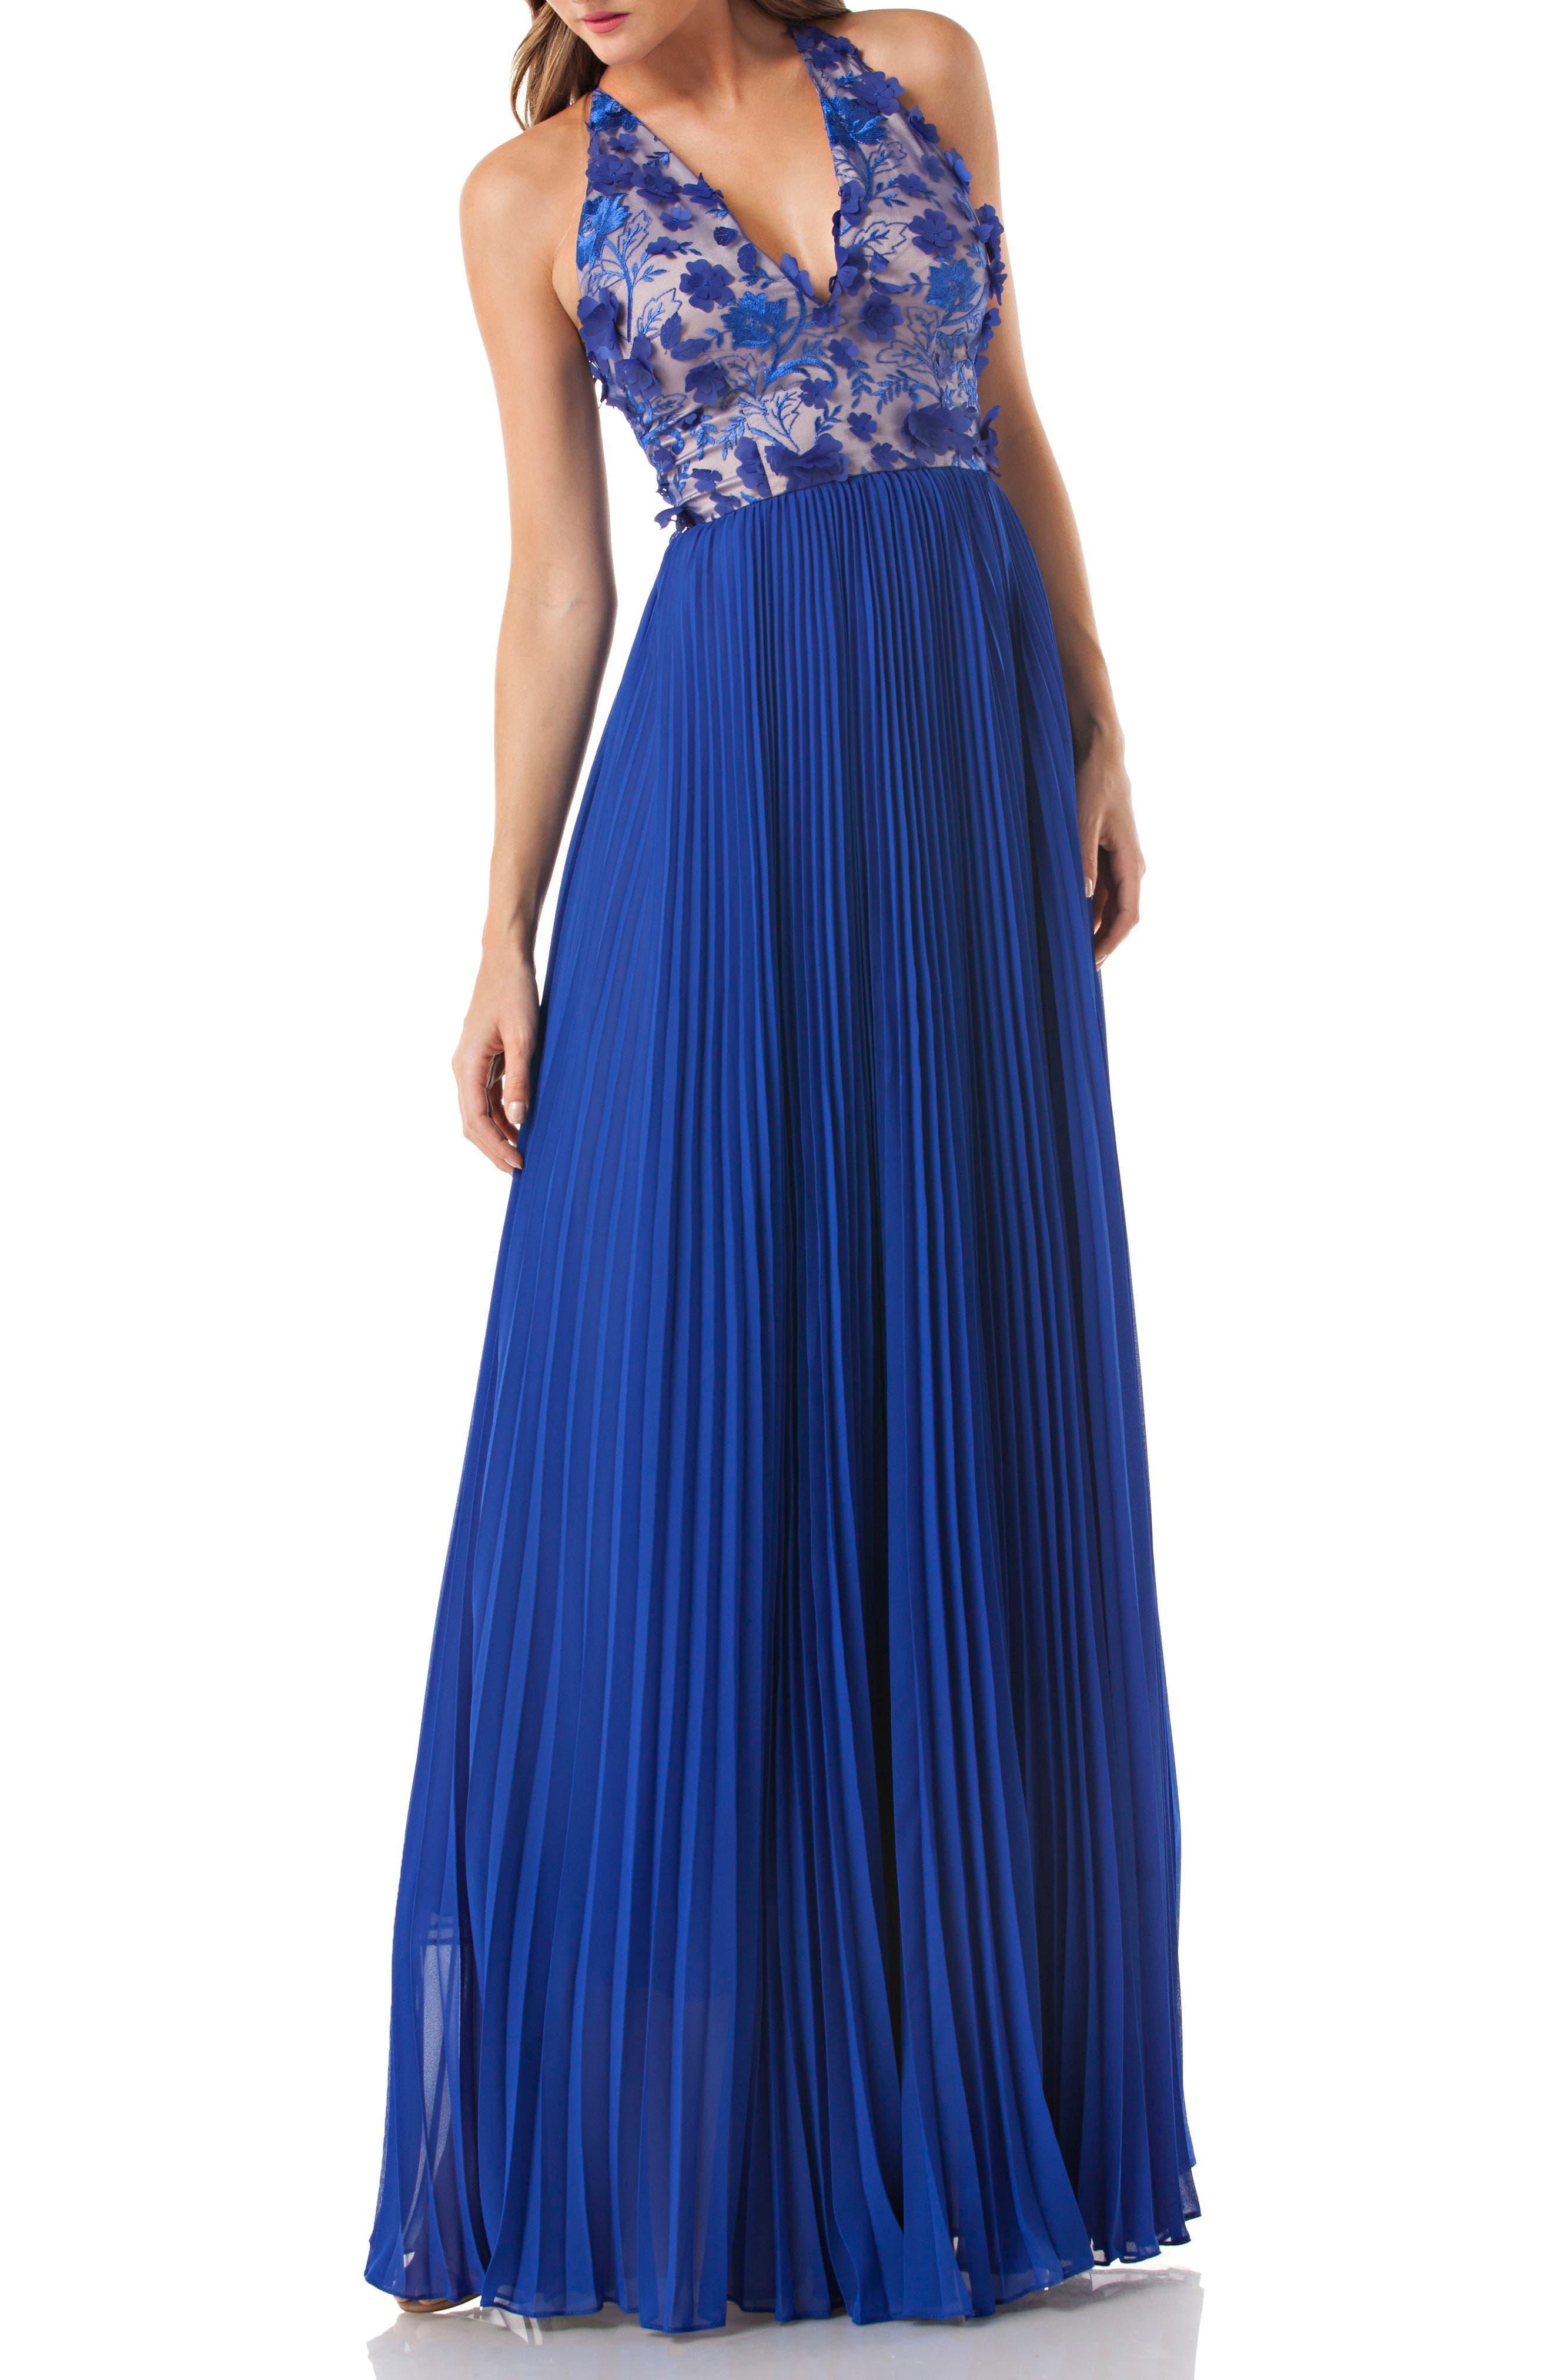 Petals Halter Gown,                         Main,                         color, 408